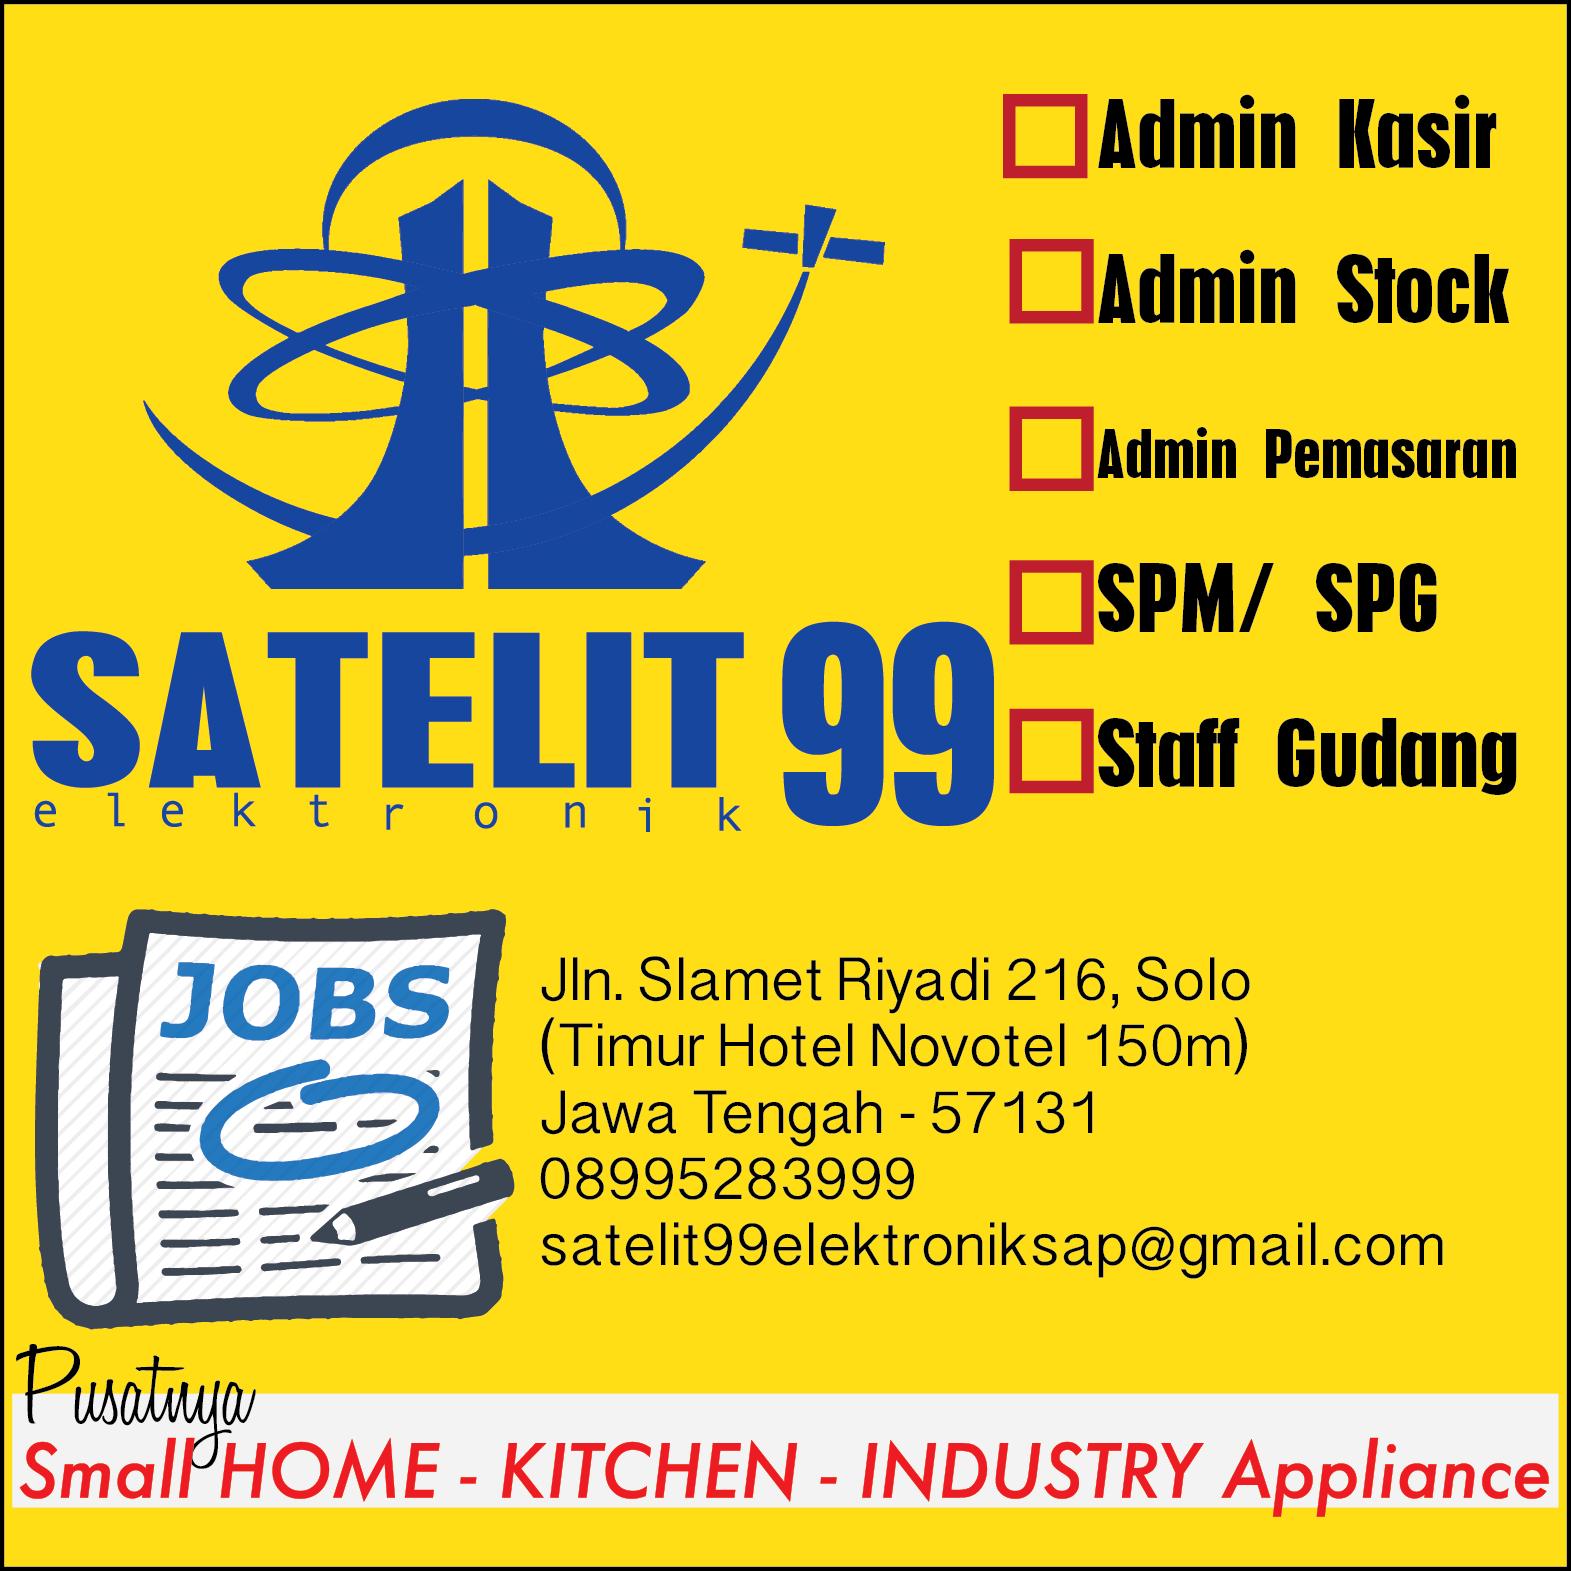 satelit 99 elektronik